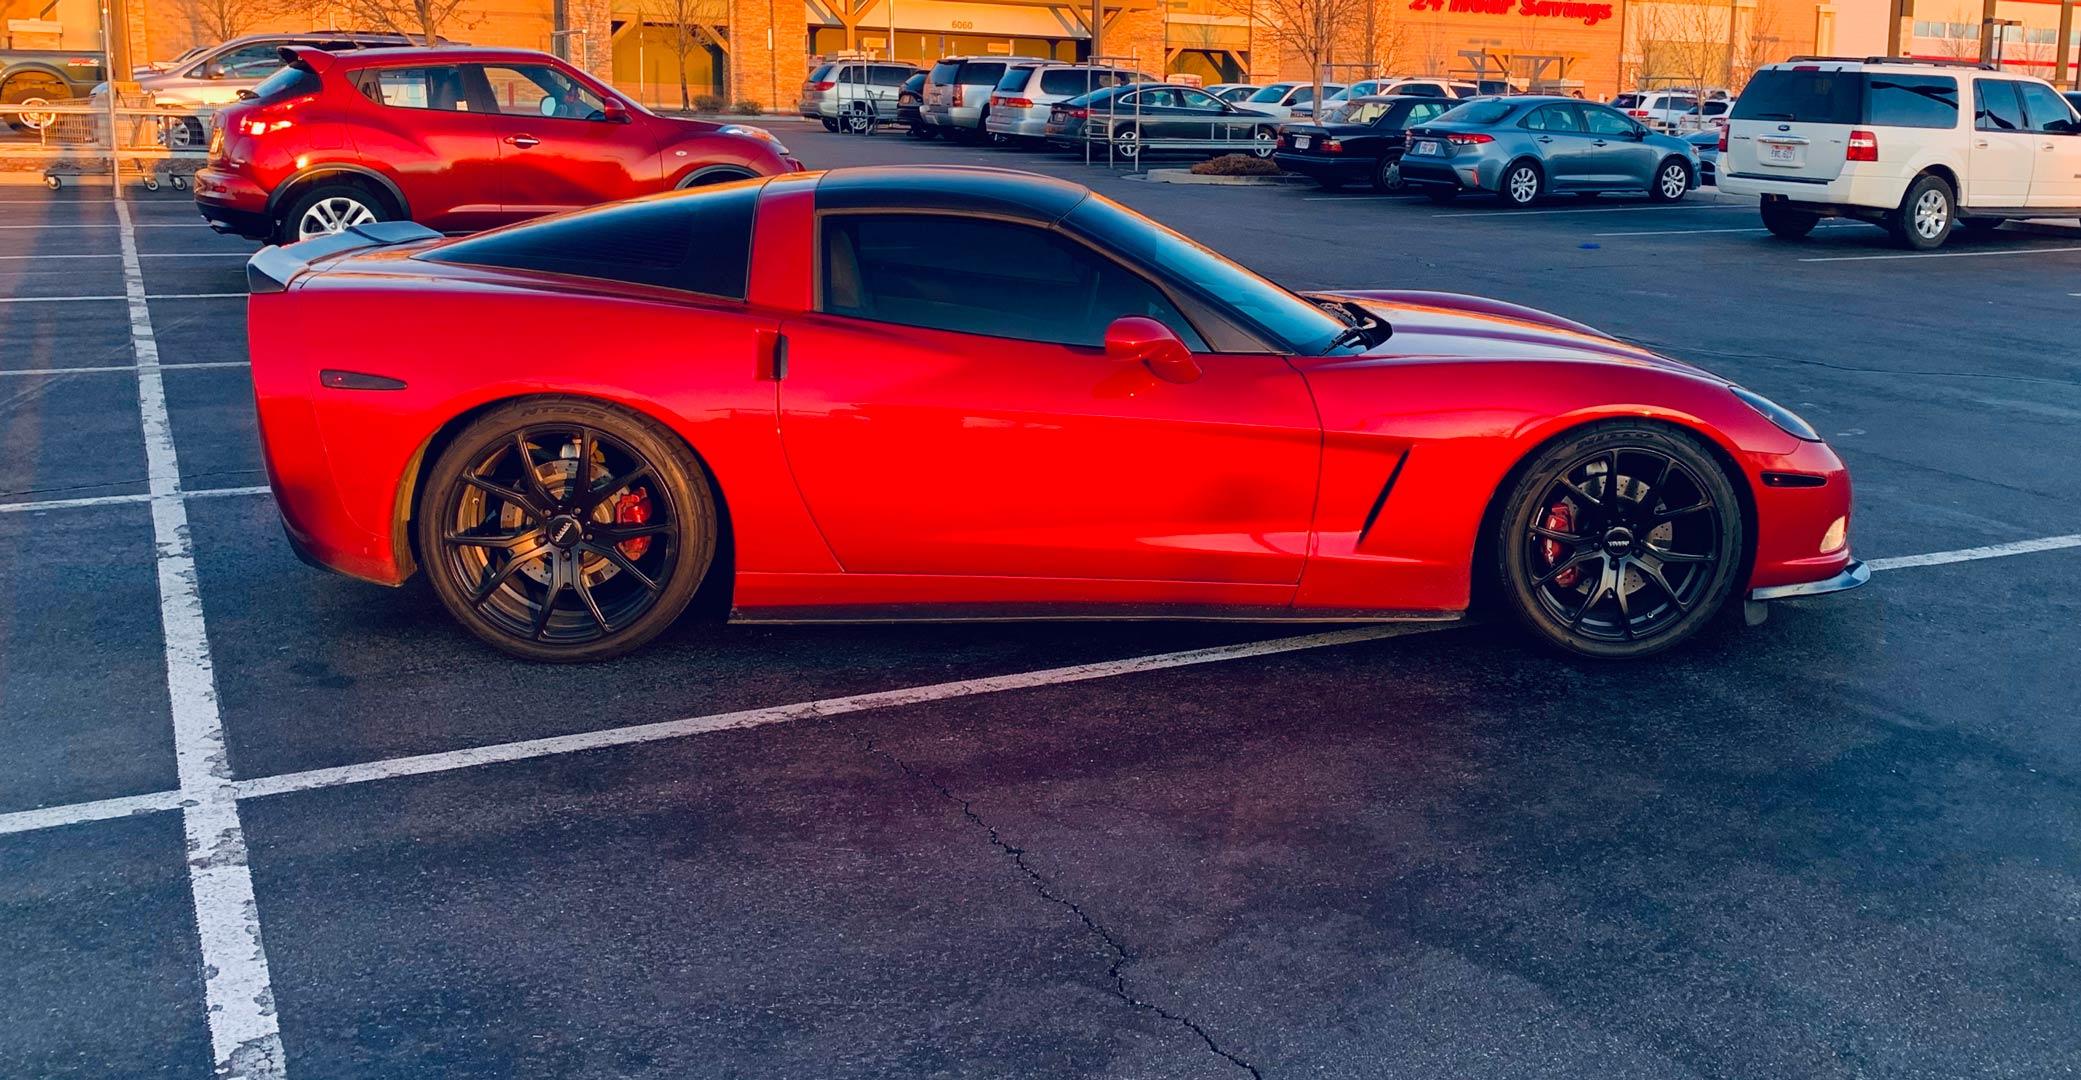 Chevy Corvette Rims Varro VD01 Wheels Black Staggered